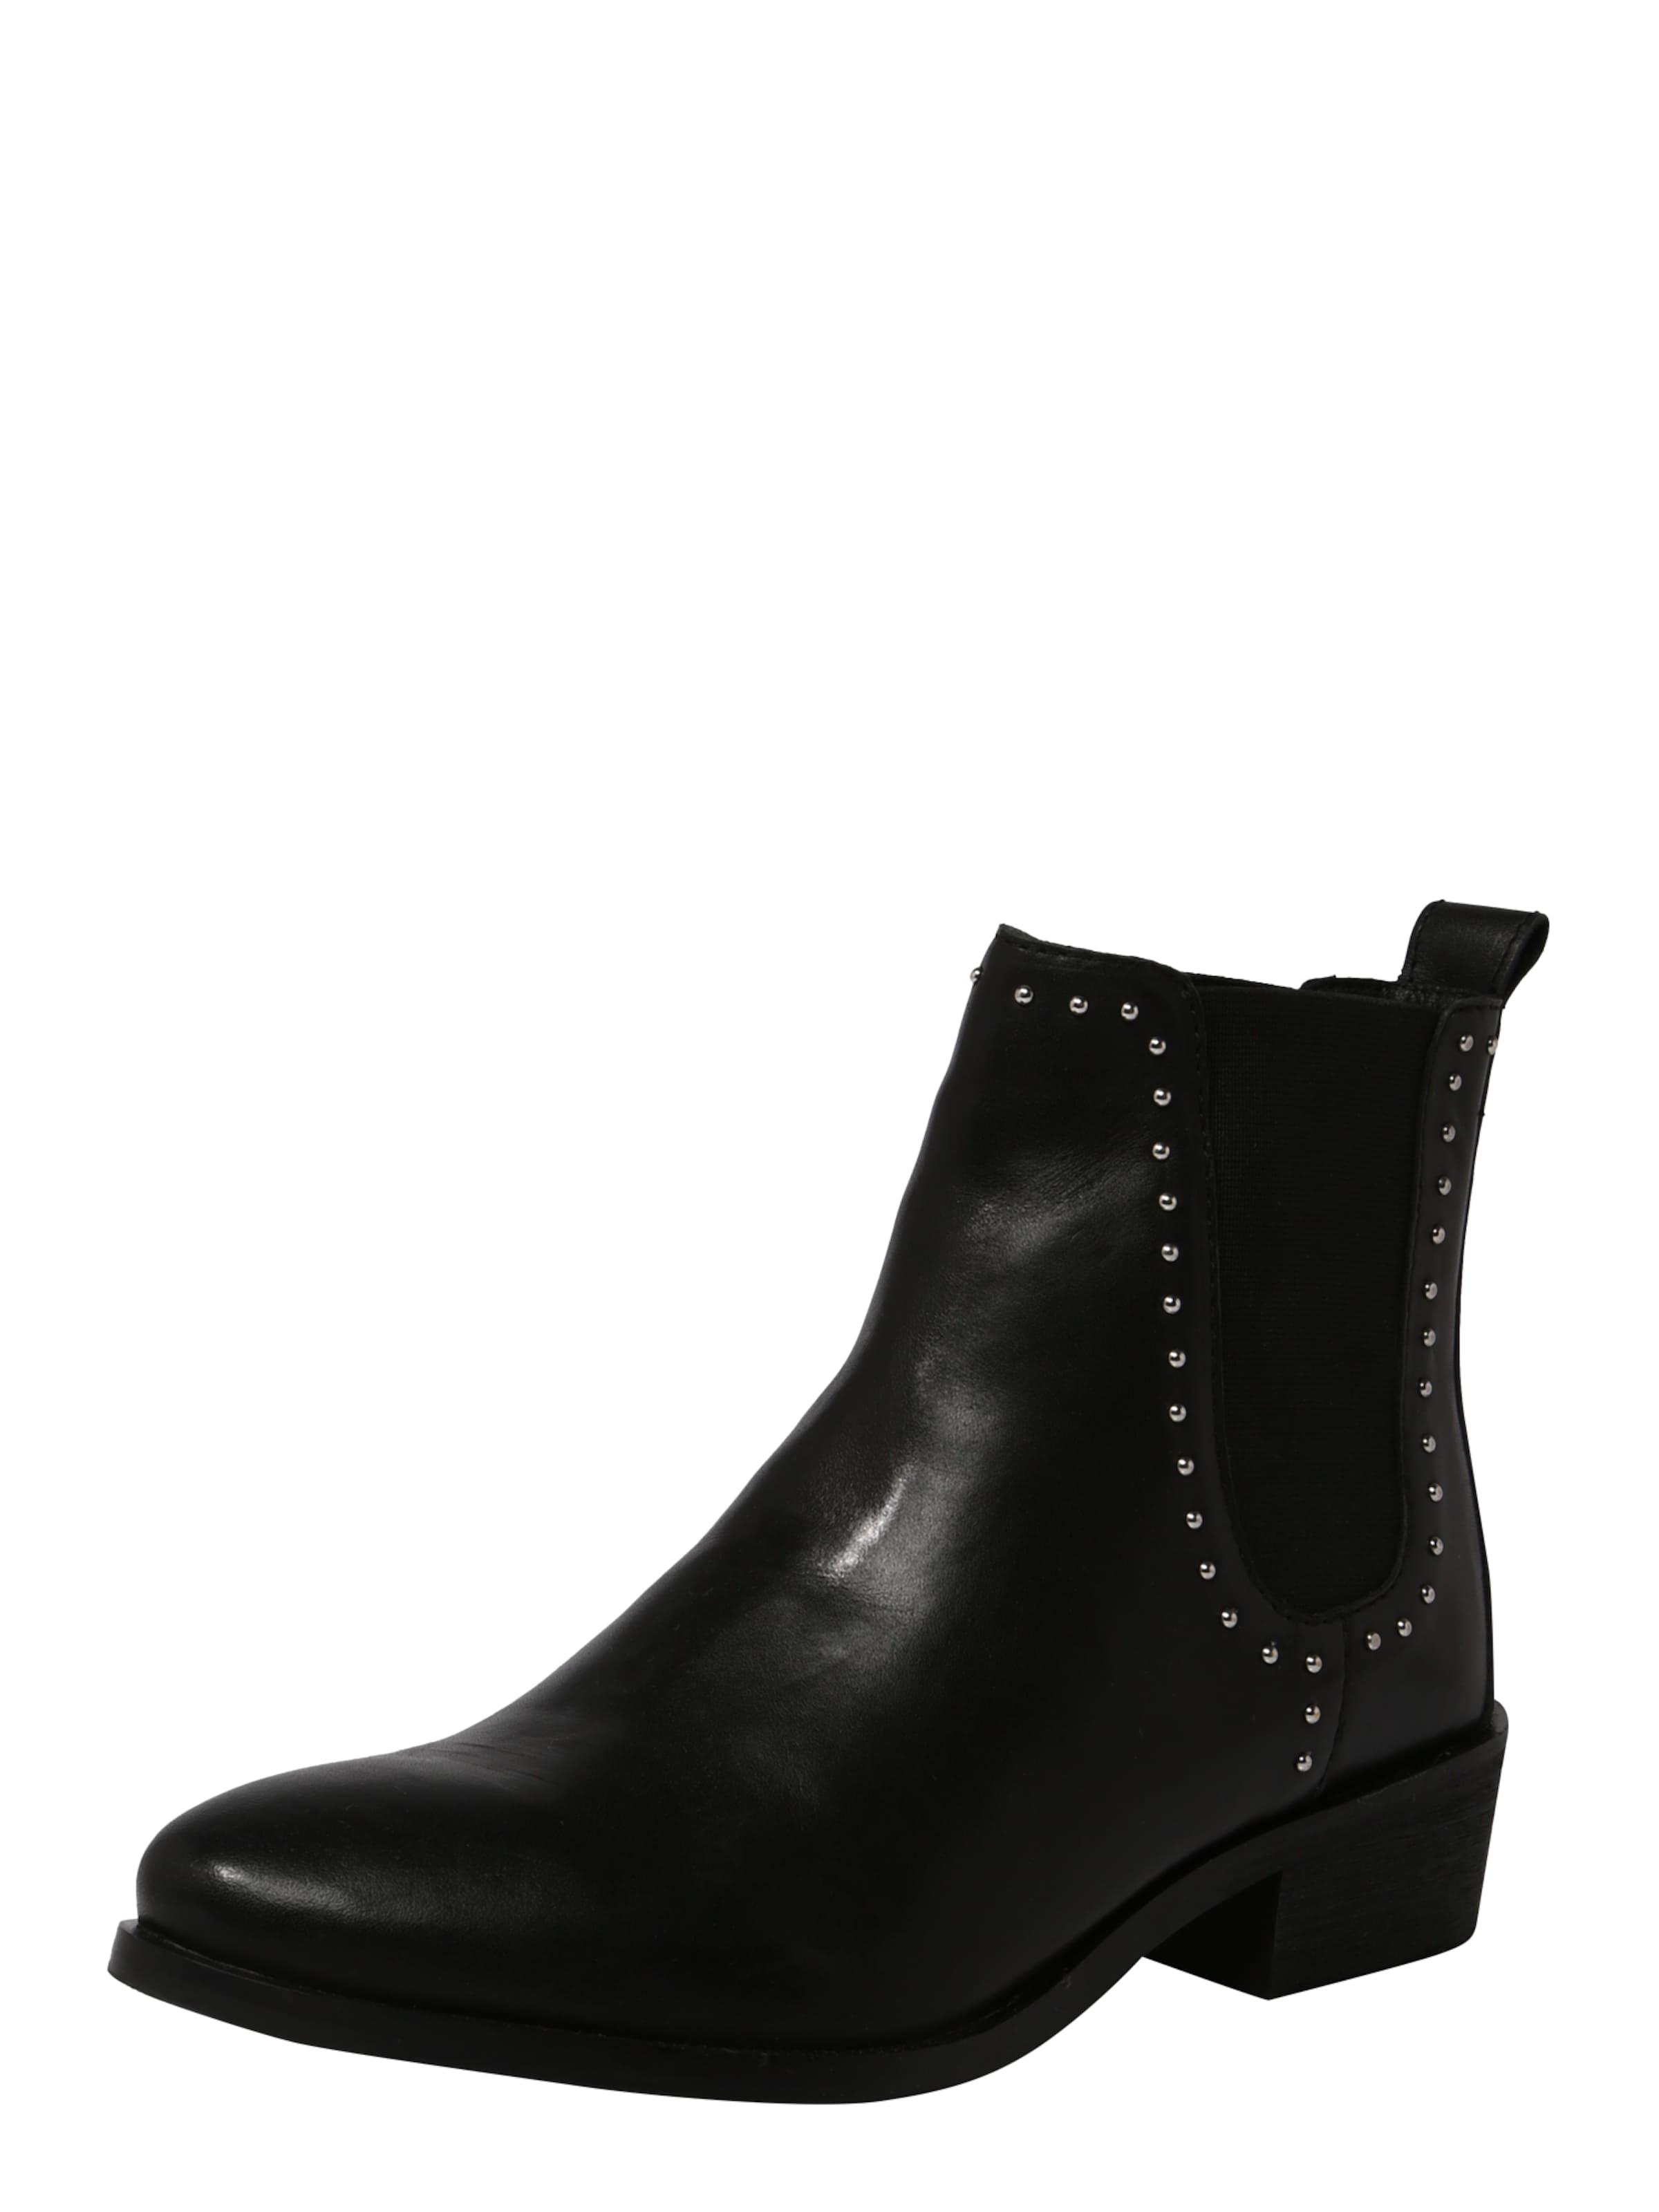 You Boots About 'juliane' Chelsea En Noir 4jA5RLq3